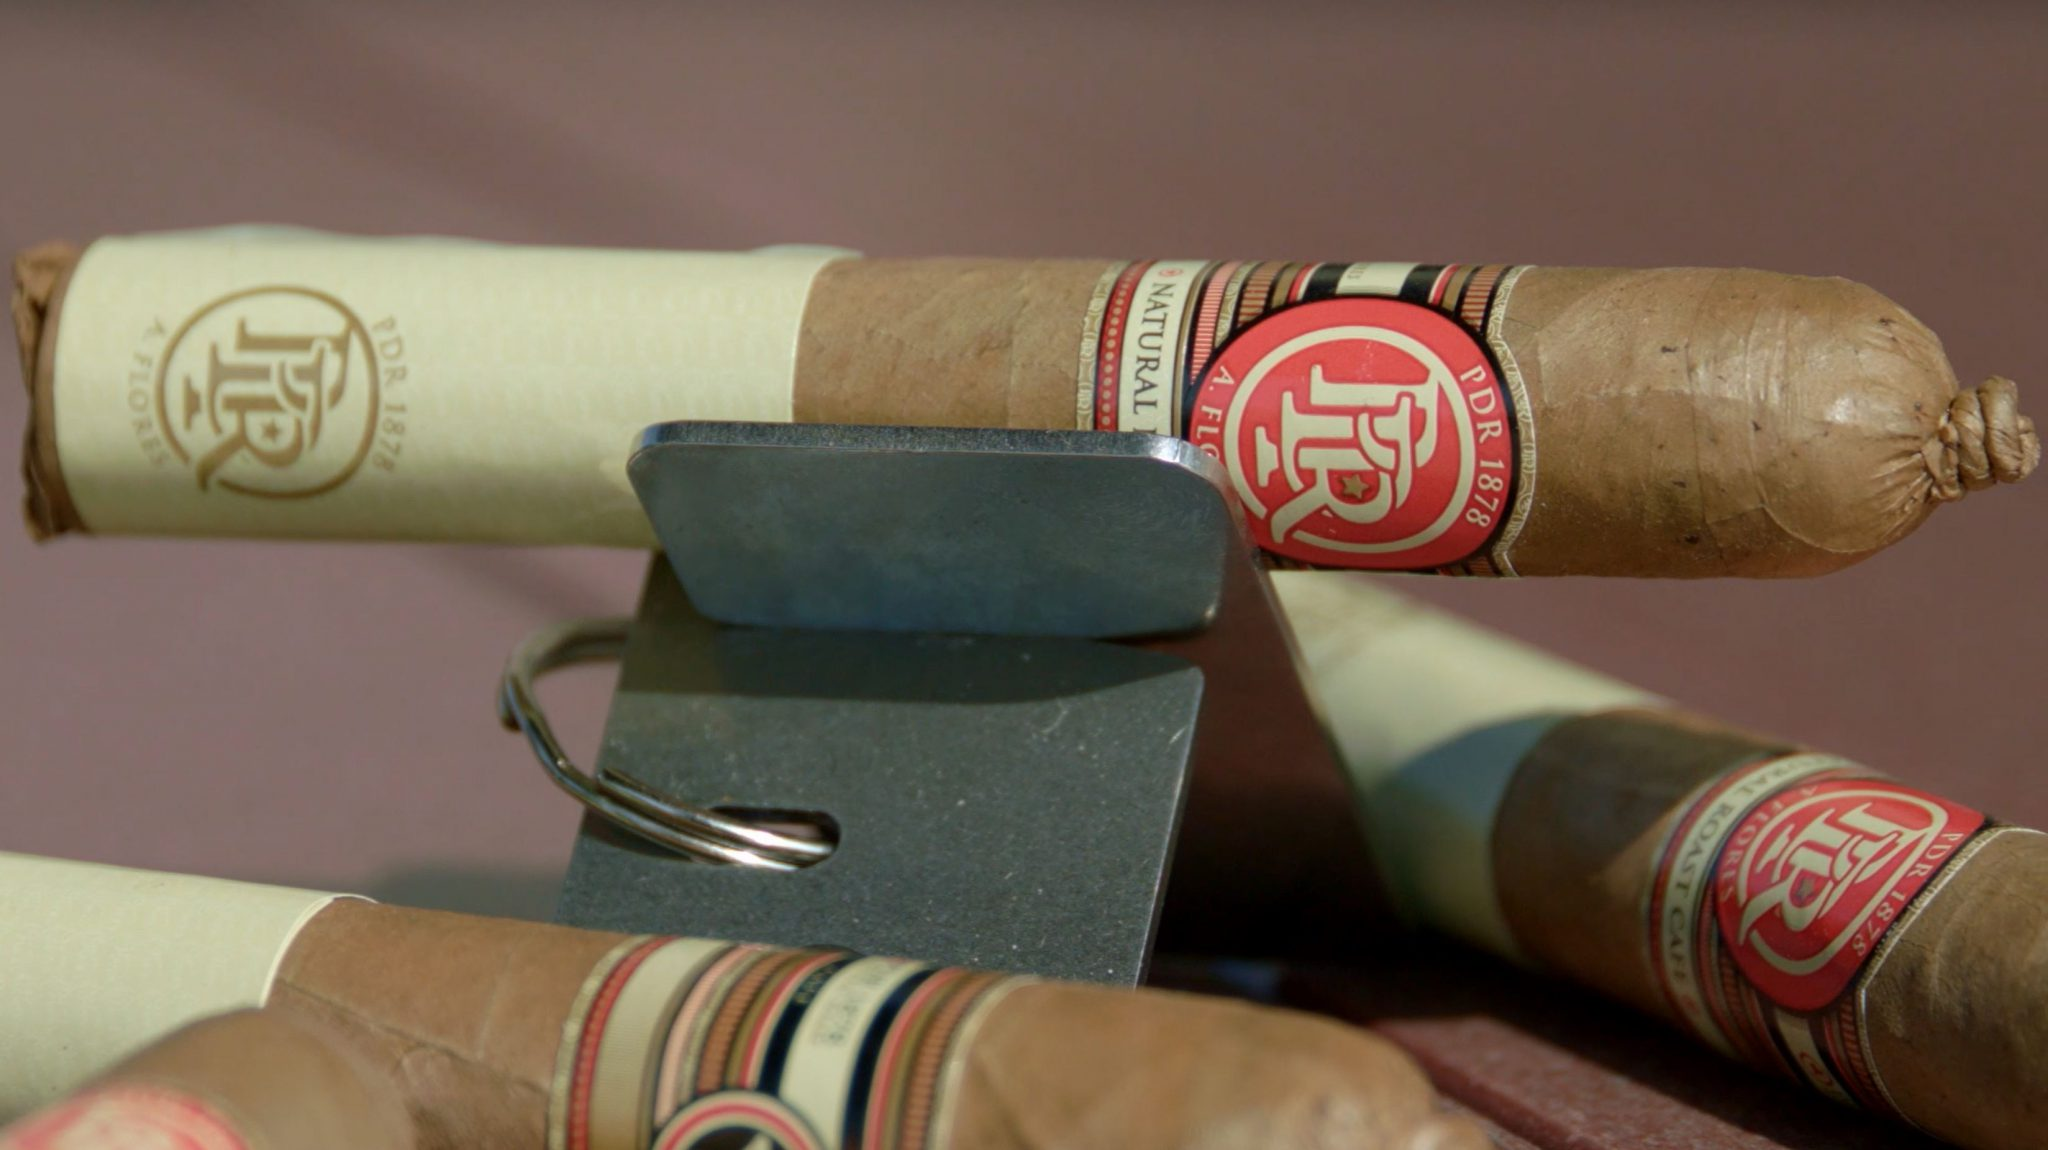 PDR cigars PDR 1878 Natural Roast Café Cigar Review at Famous Smoke Shop cigar setup shot on table